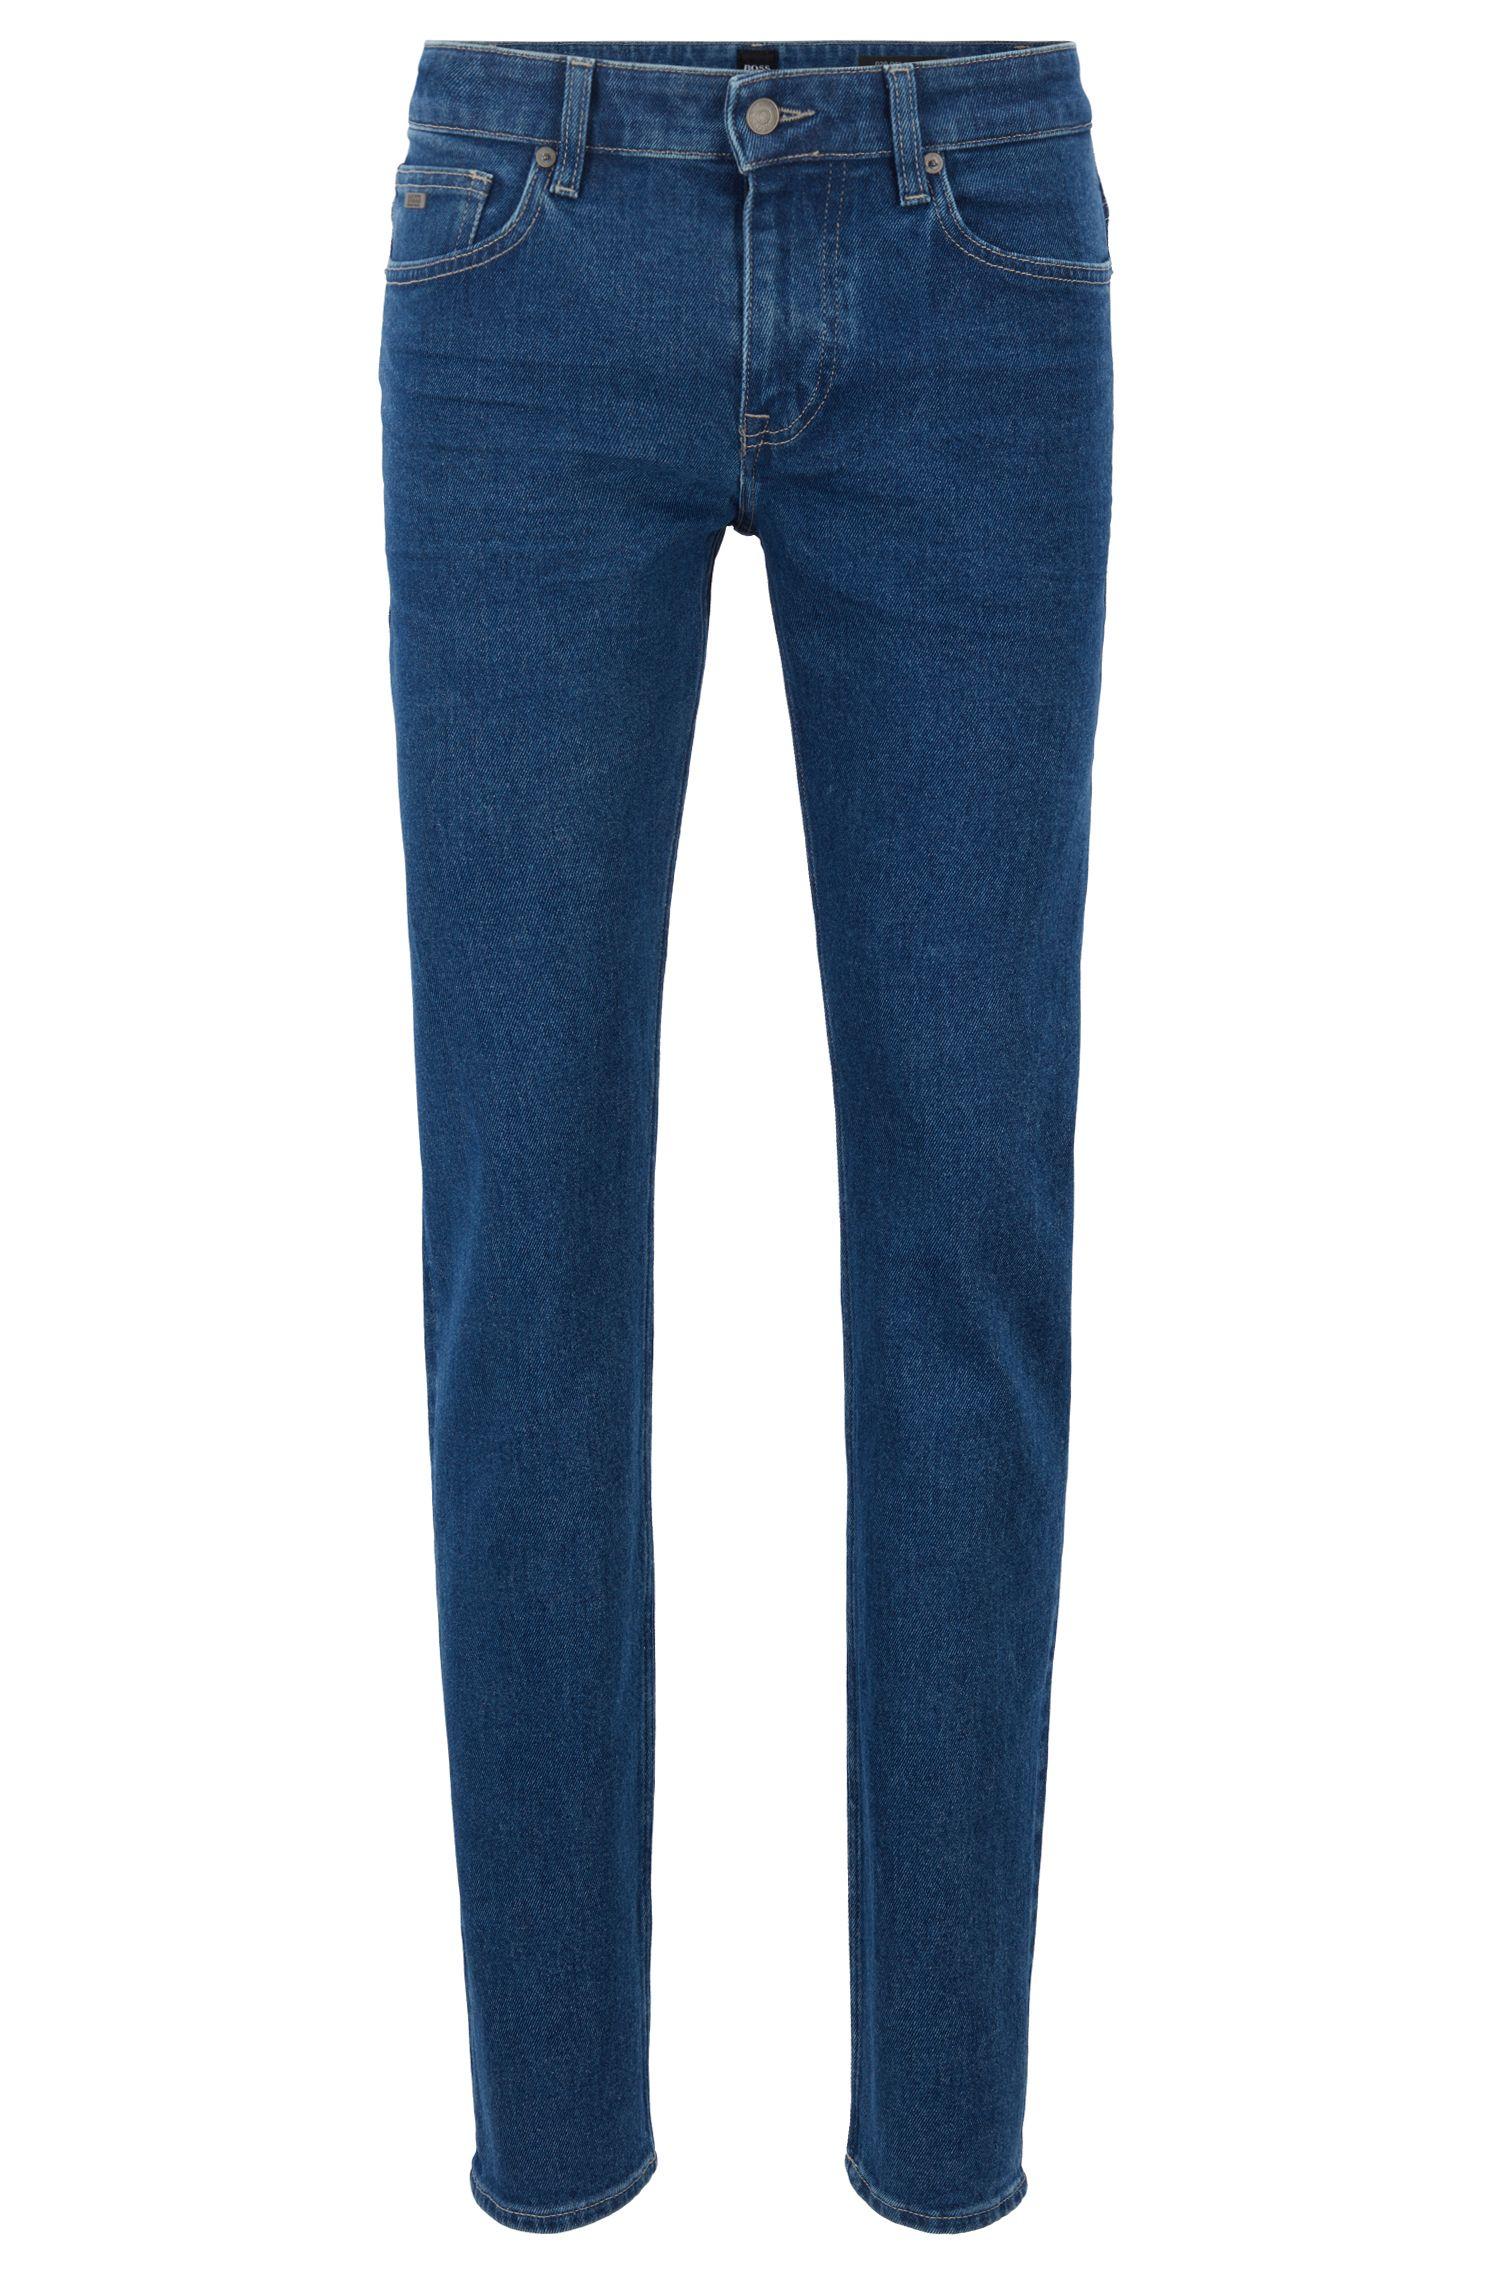 Slim-fit jeans in eco-friendly dyed salt-and-pepper denim, Dark Blue